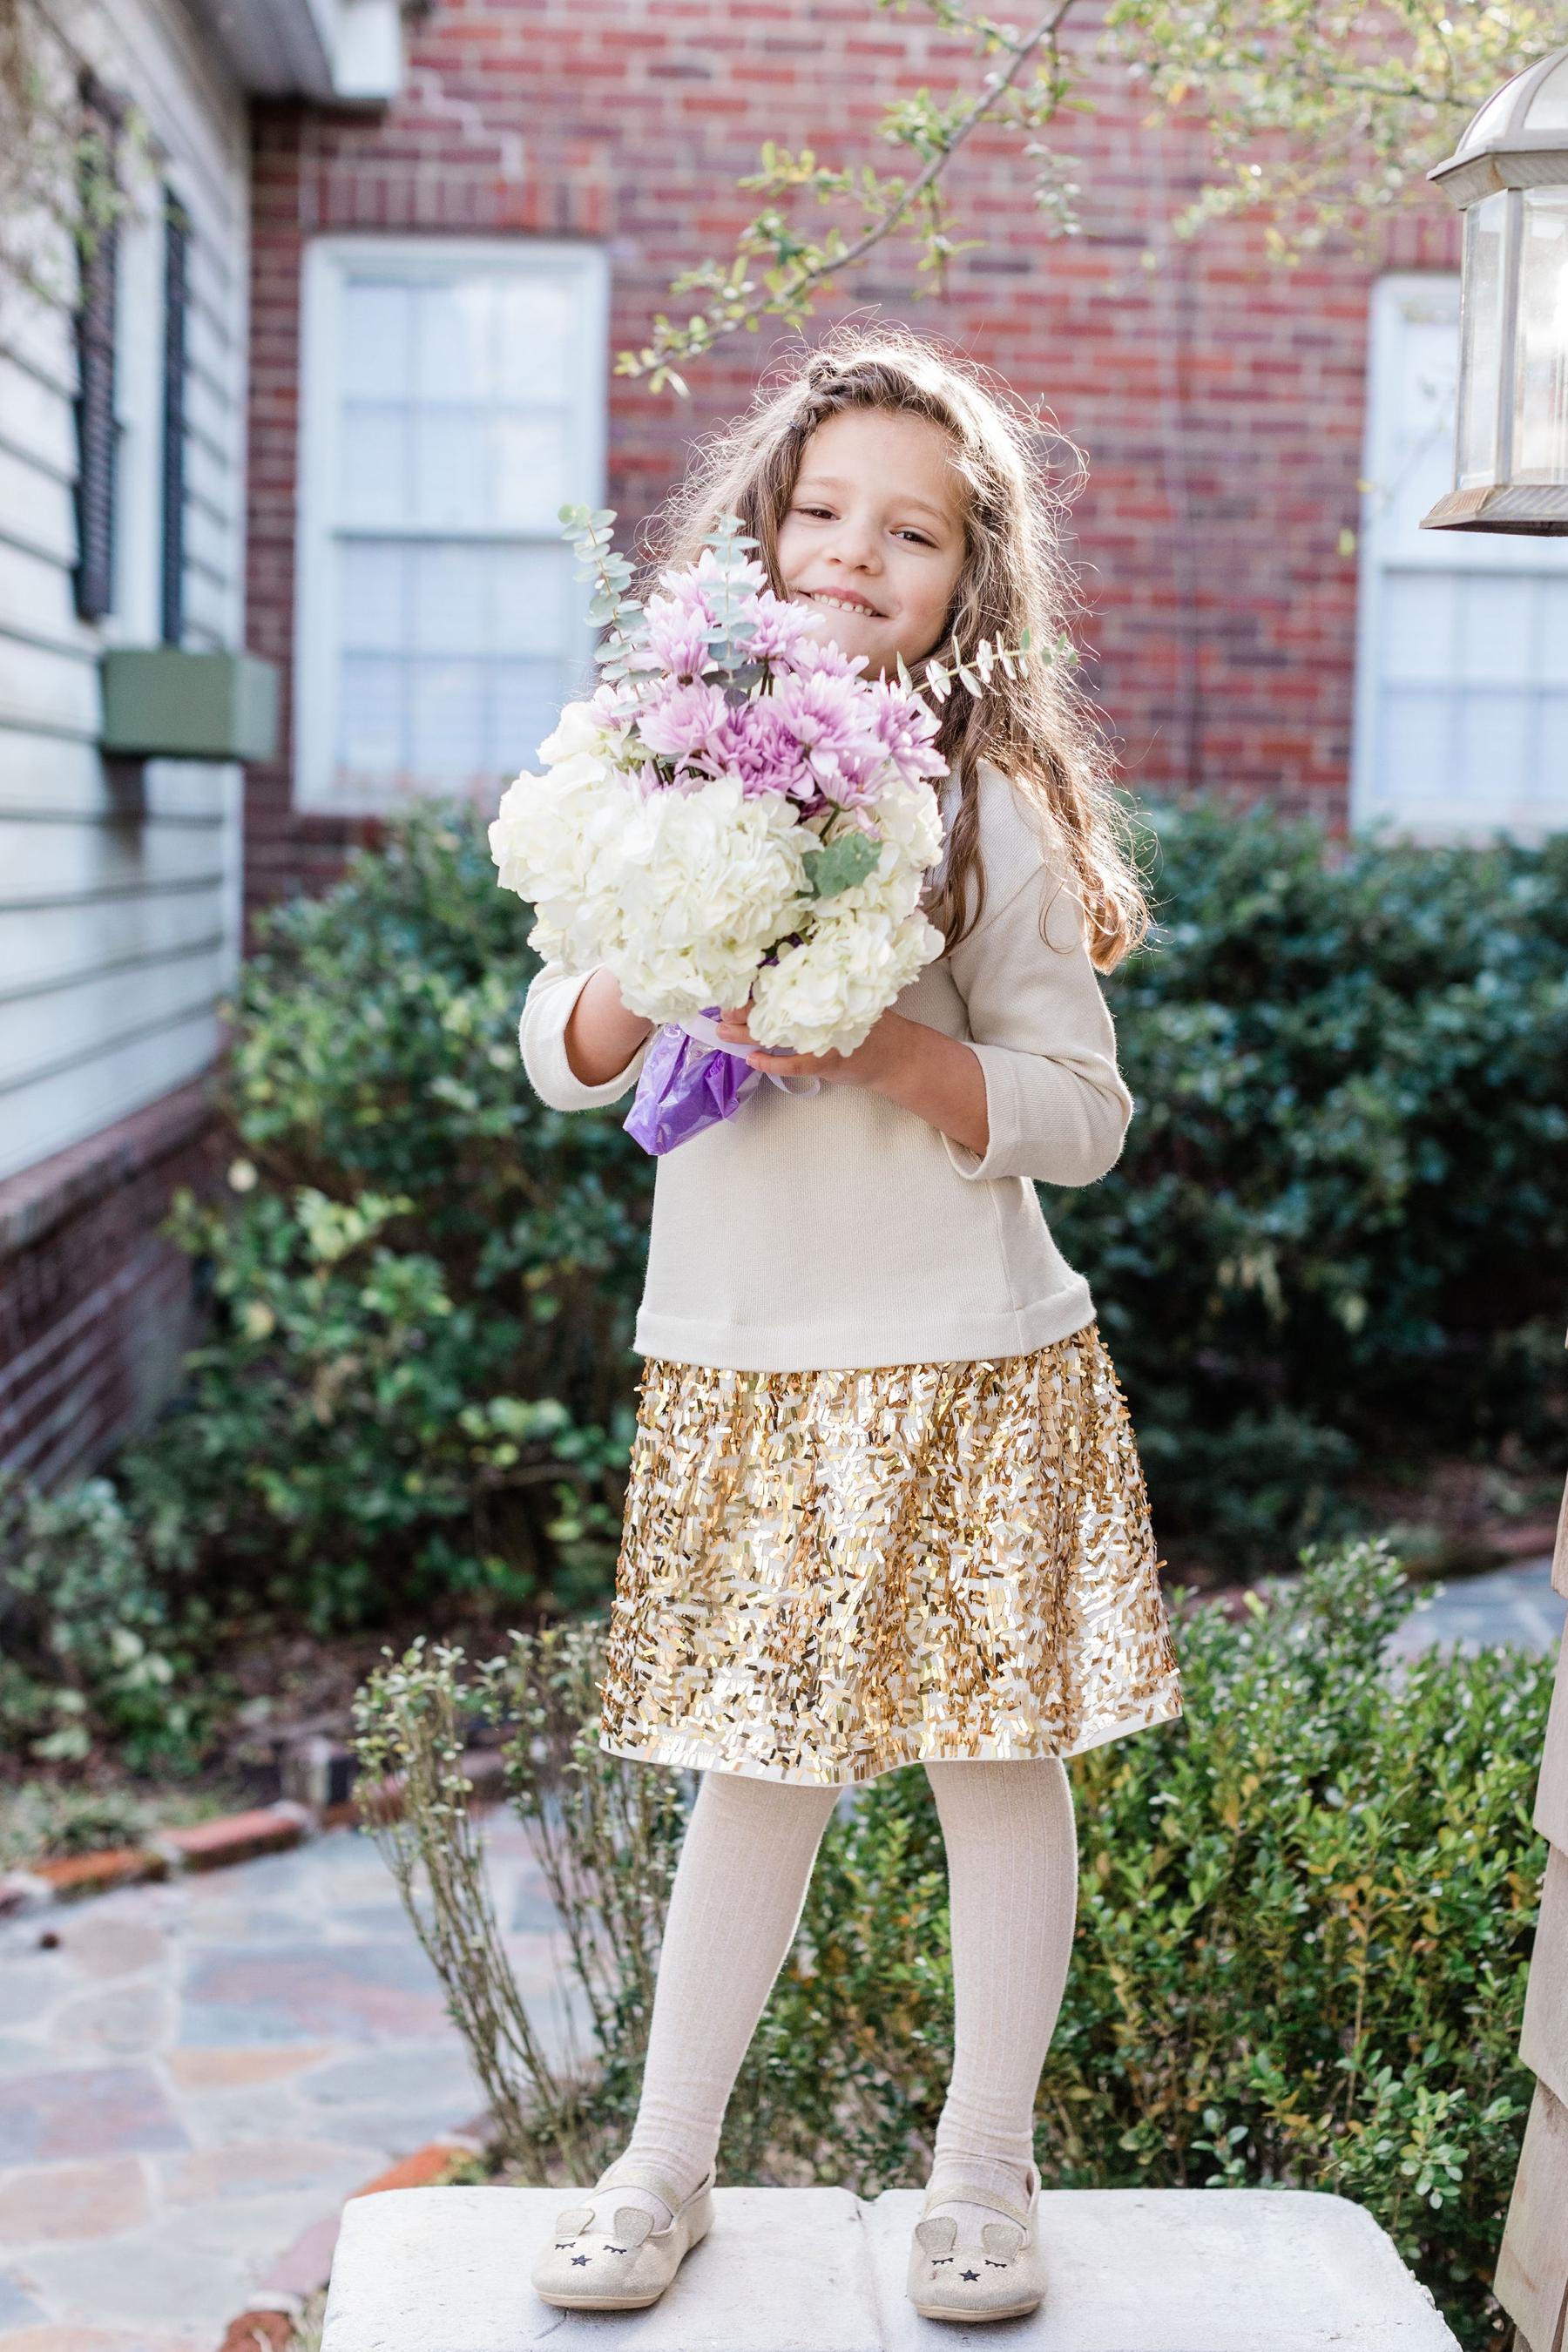 Daria and Scott's Savannah Elopement - Savannah Elopement Photographer | Apt. B Photography